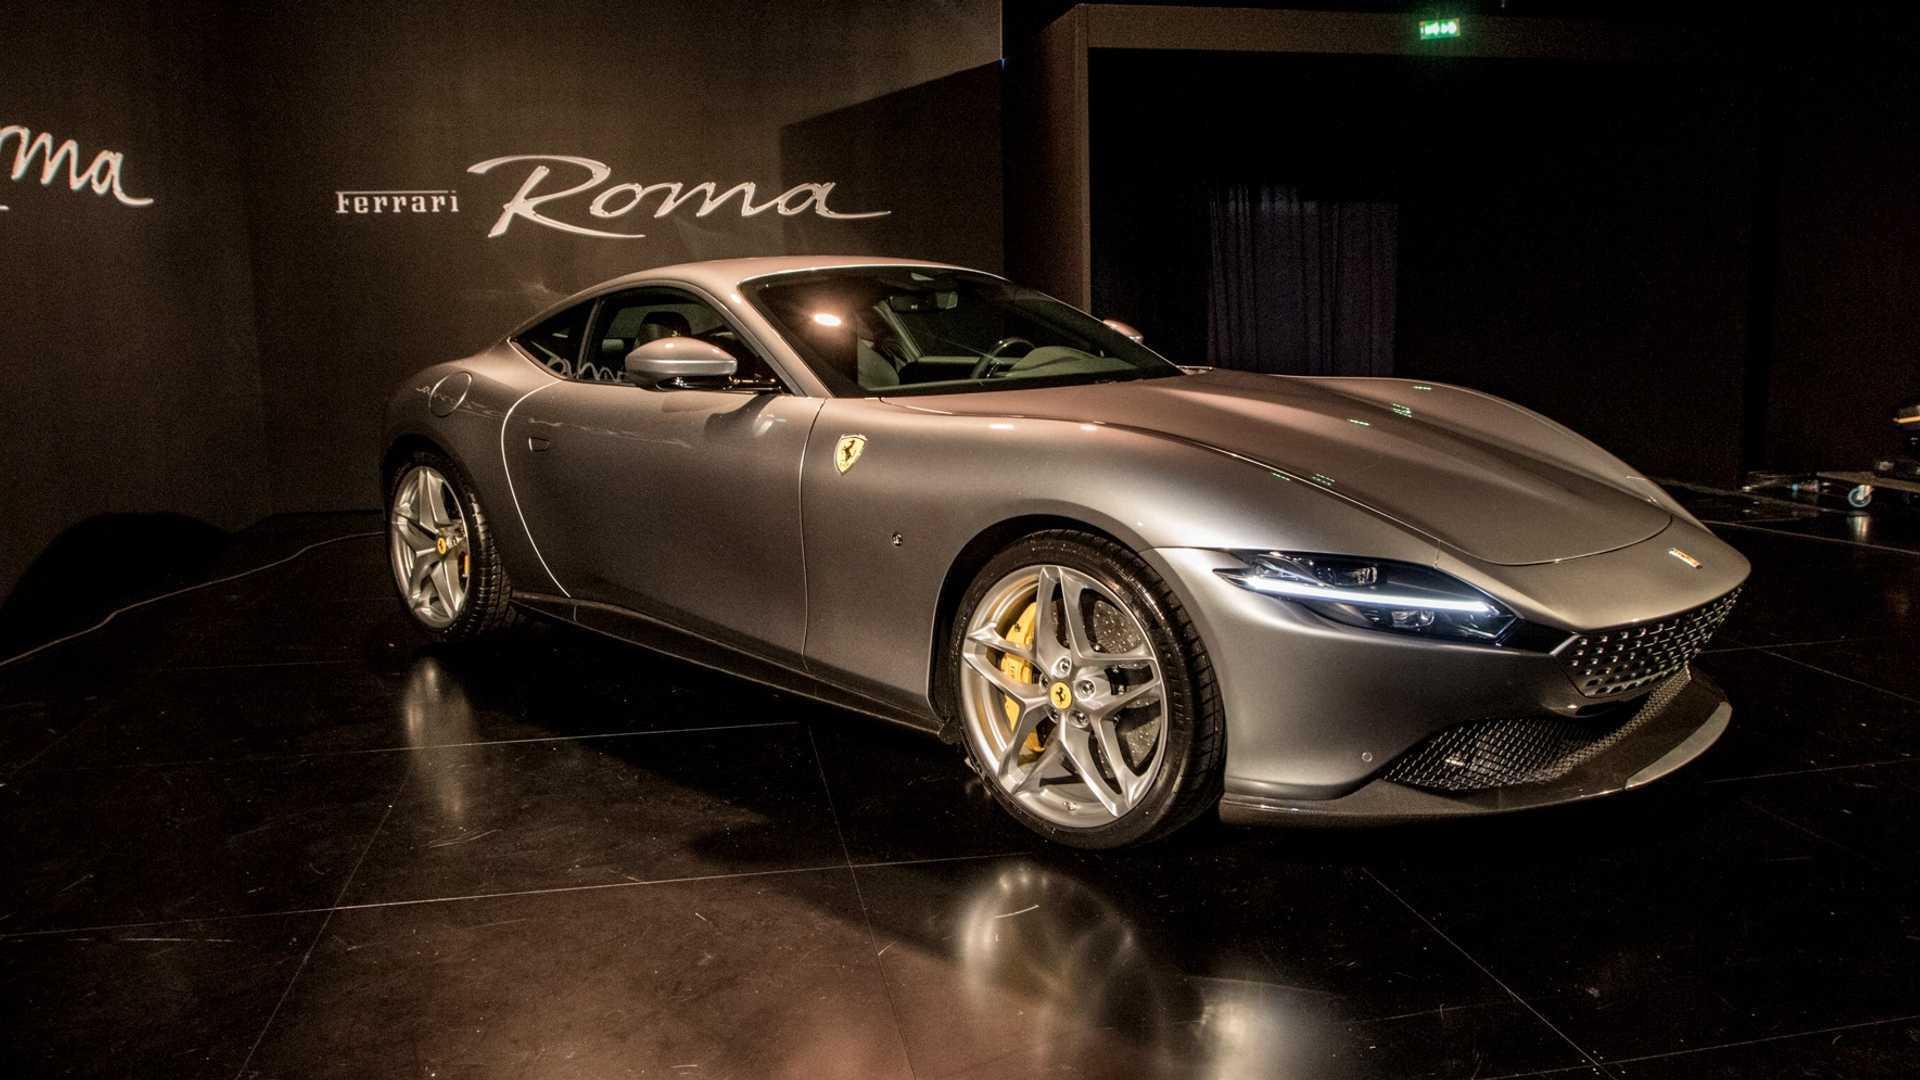 Ferrari Rome, Live photos